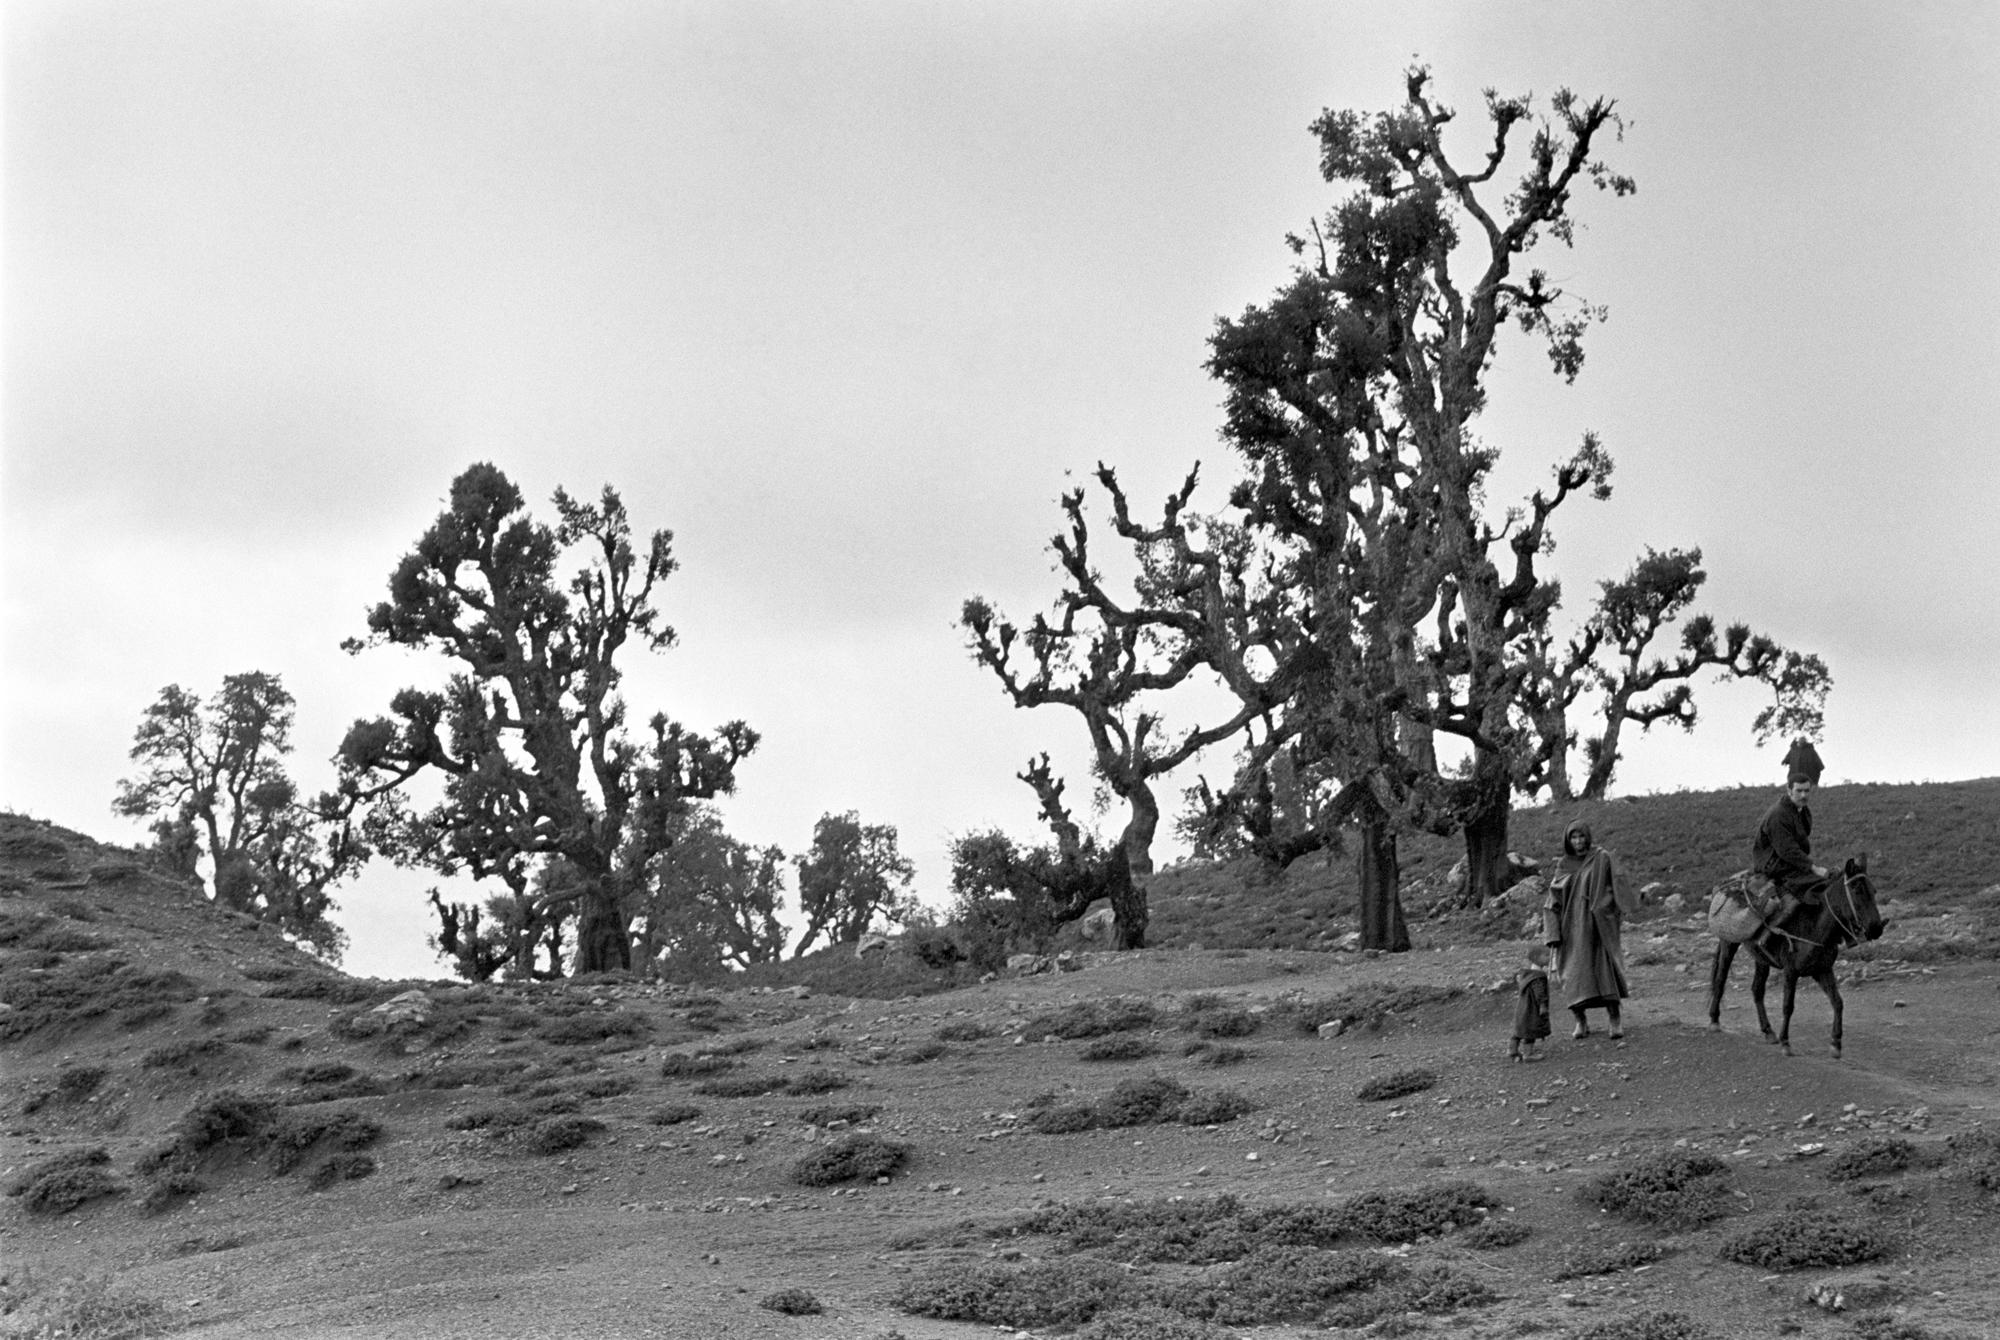 Atlas Mts, Morocco 1971